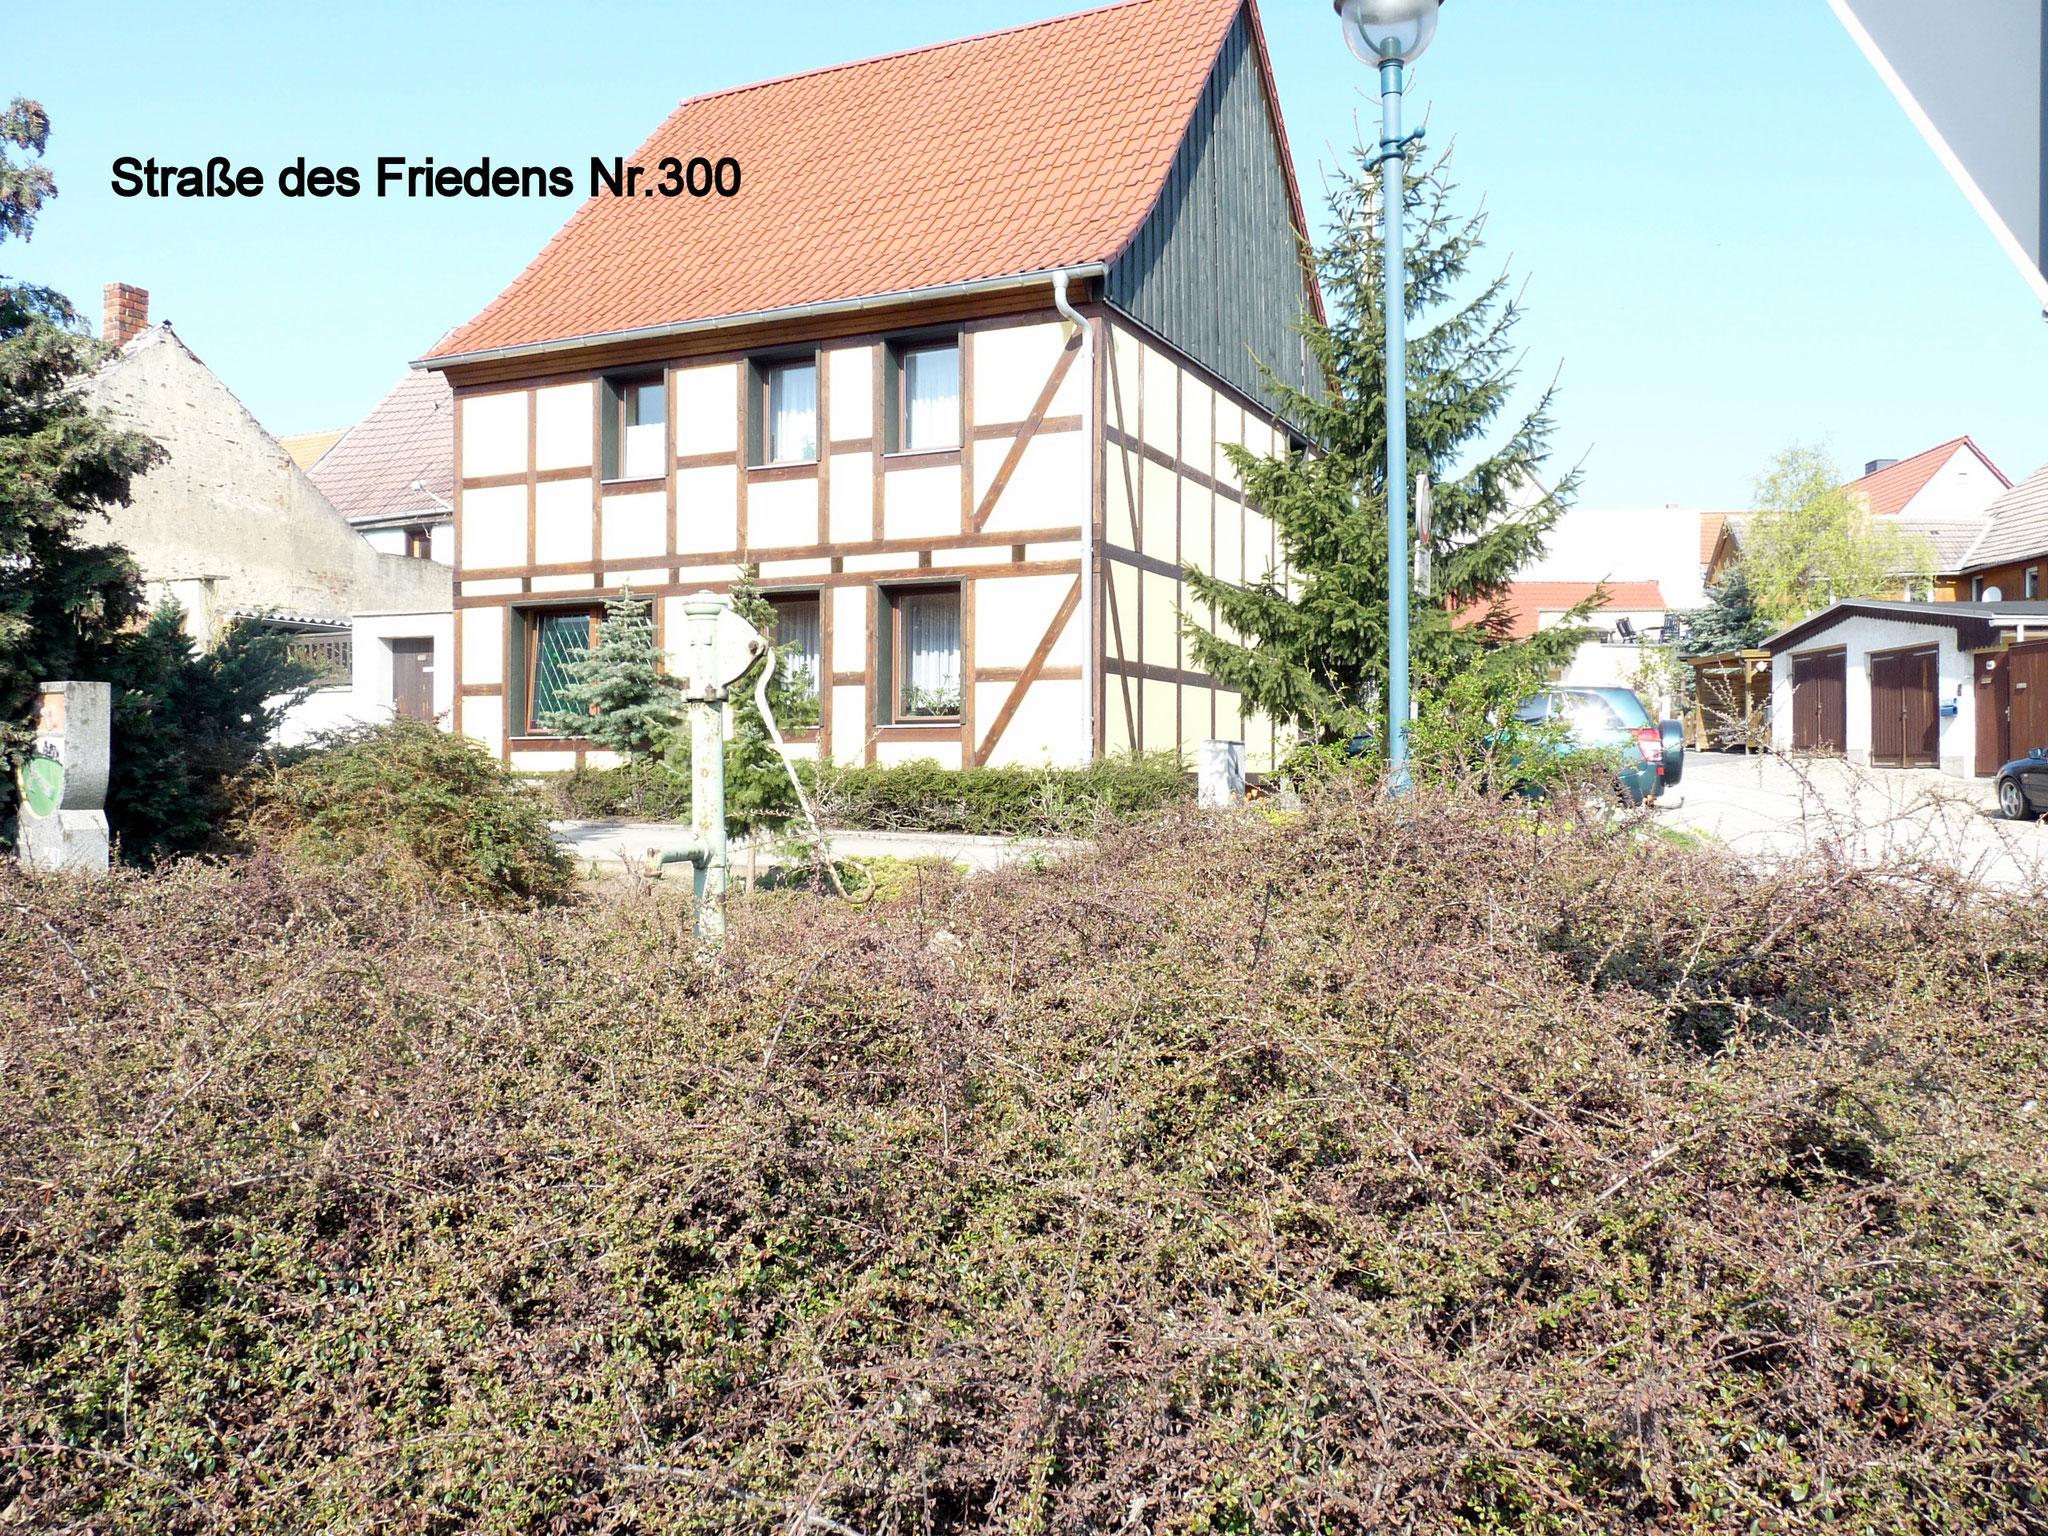 Str. d. Friedens/ Thieberg 300